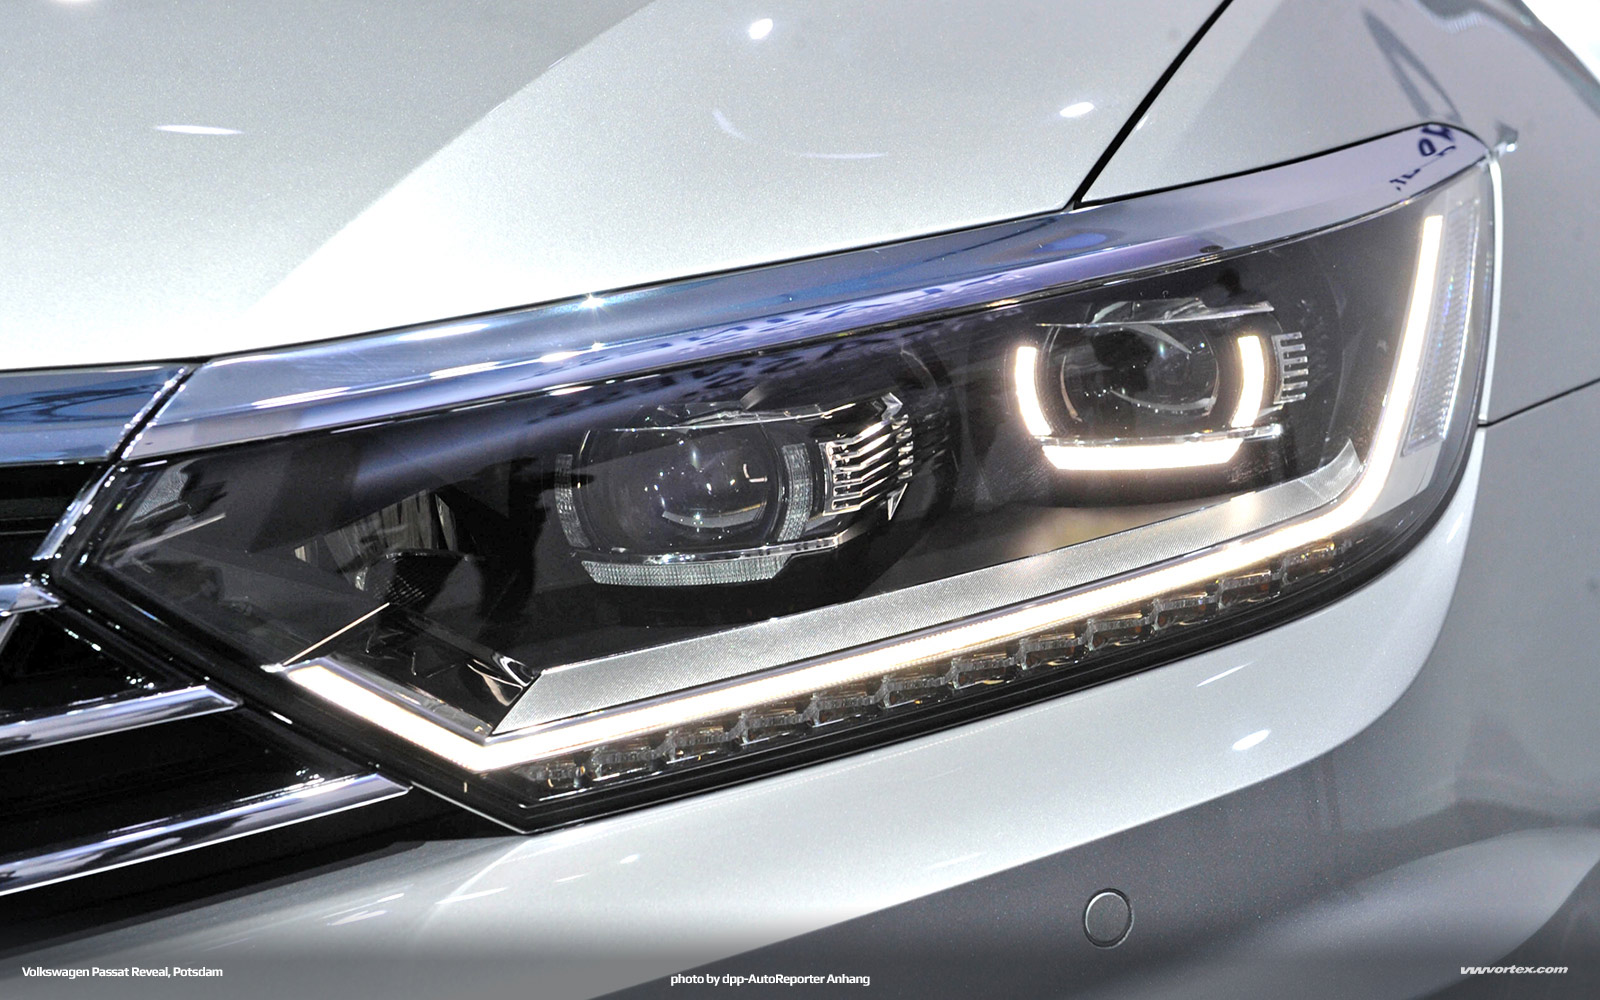 2014 Volkswagen Passat VIII MQB Reveal Potsdam 654 600x300